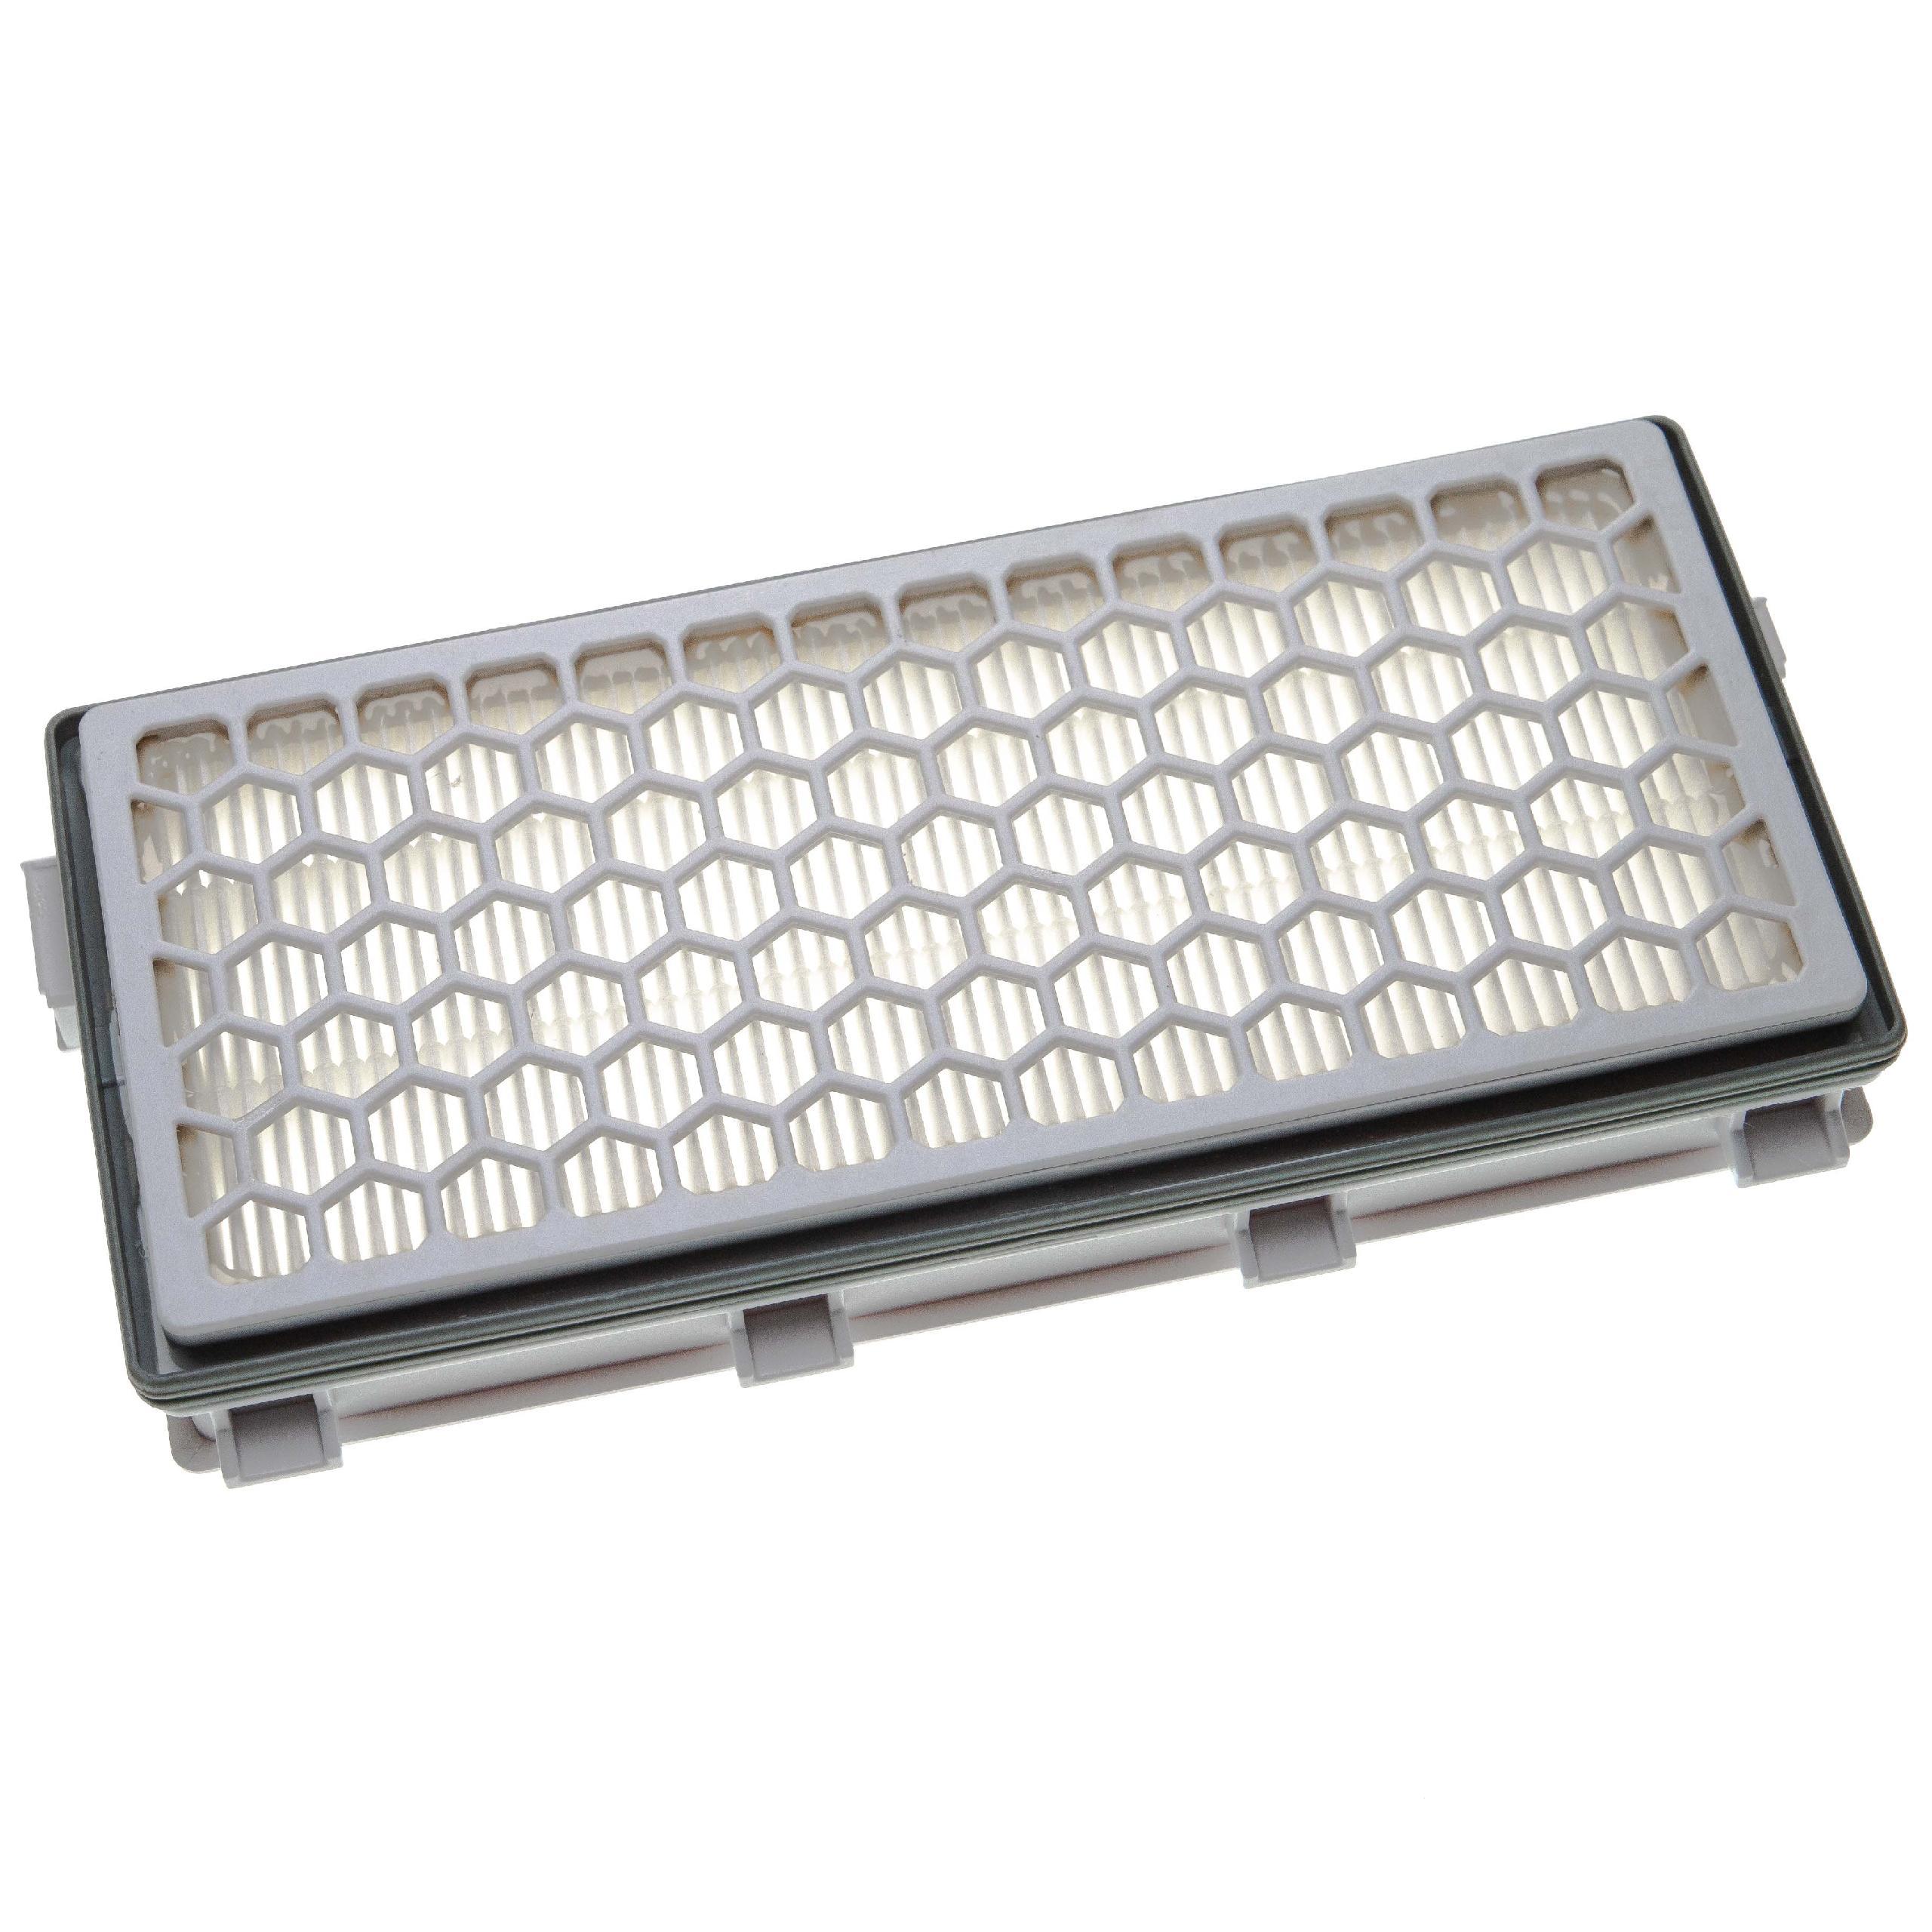 Abluftfilter HEPA Filter H13 für Miele Complete C2 Jubilee Powerline